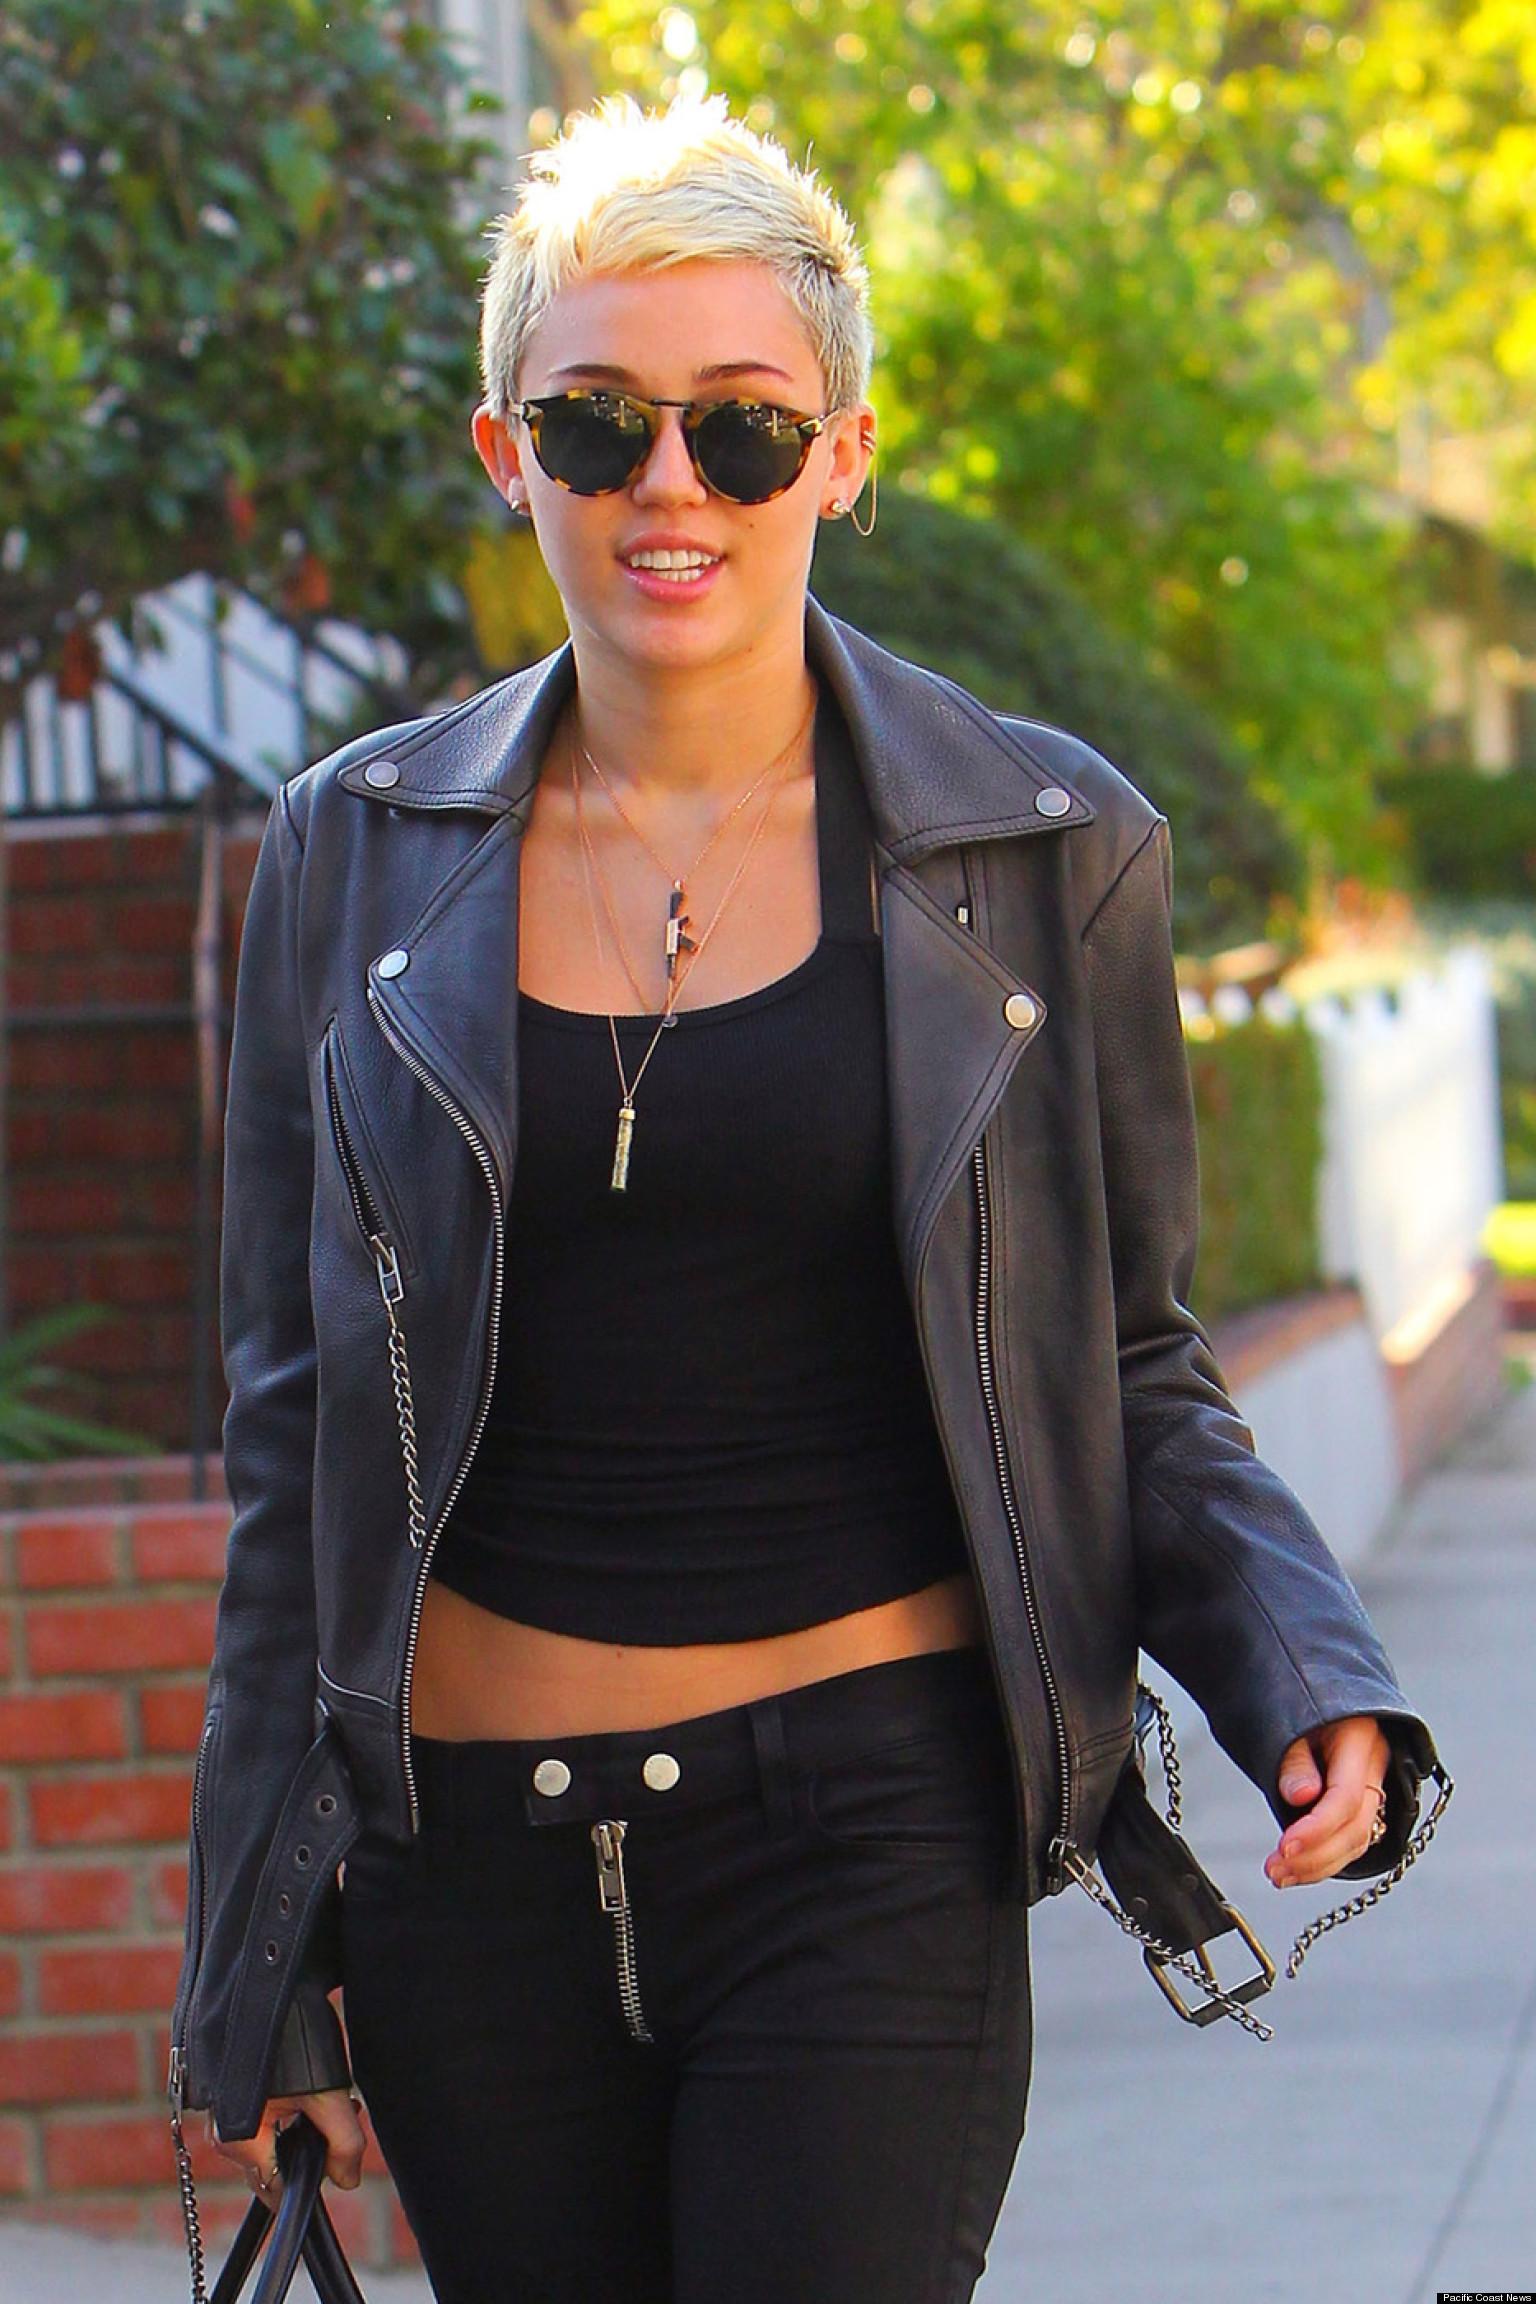 Image O Miley Cyrus Short Hair Facebookg Project Peacock Wiki